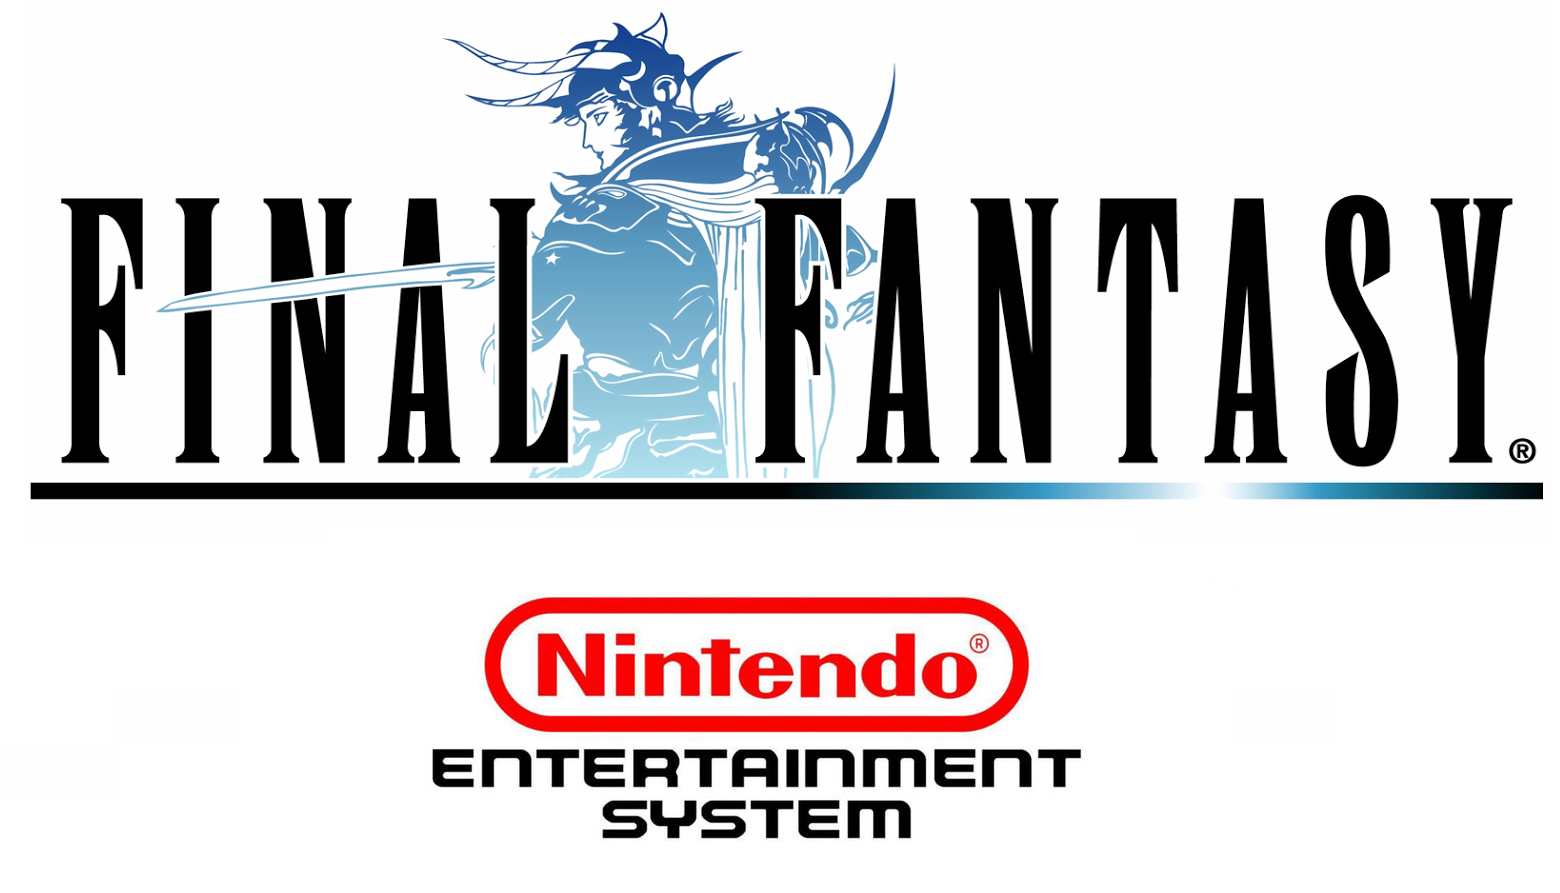 Final Fantasy (NES) Hack Finally Ready – ITGirl